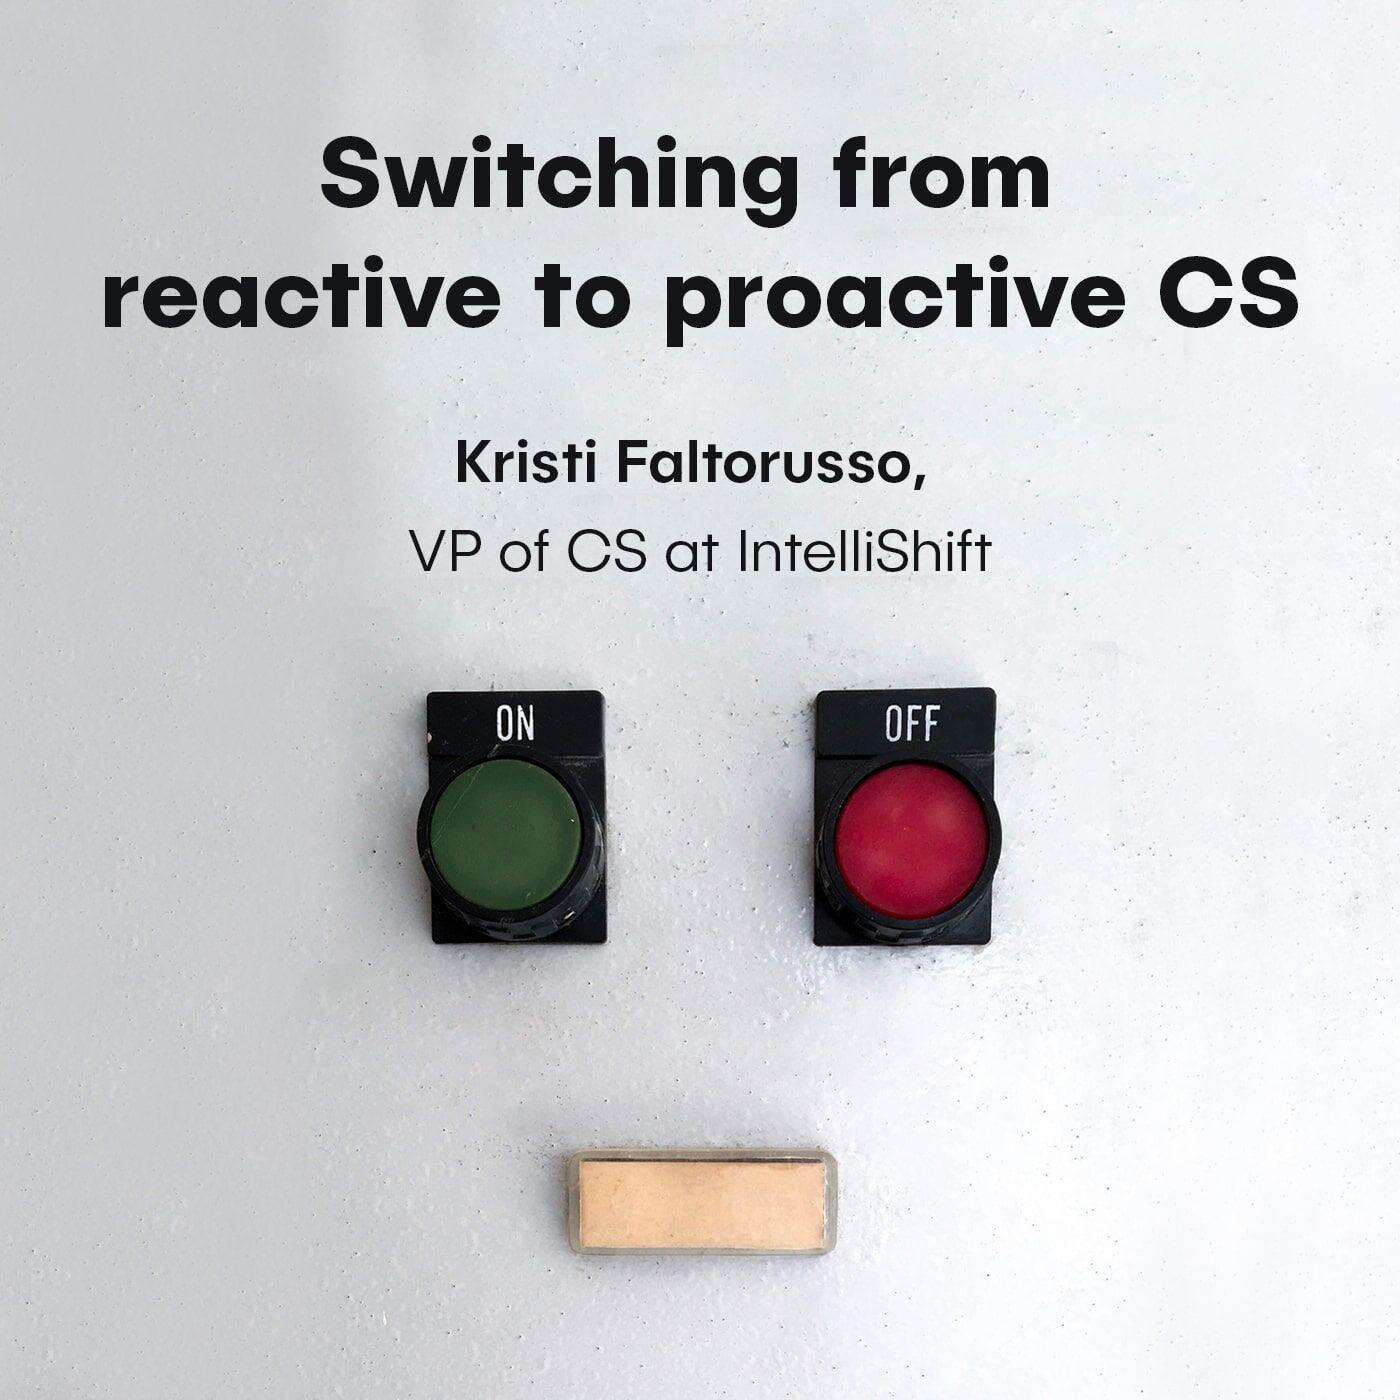 Kristi Faltorusso, VP of Customer Success at IntelliShift - Switching from reactive to proactive CS